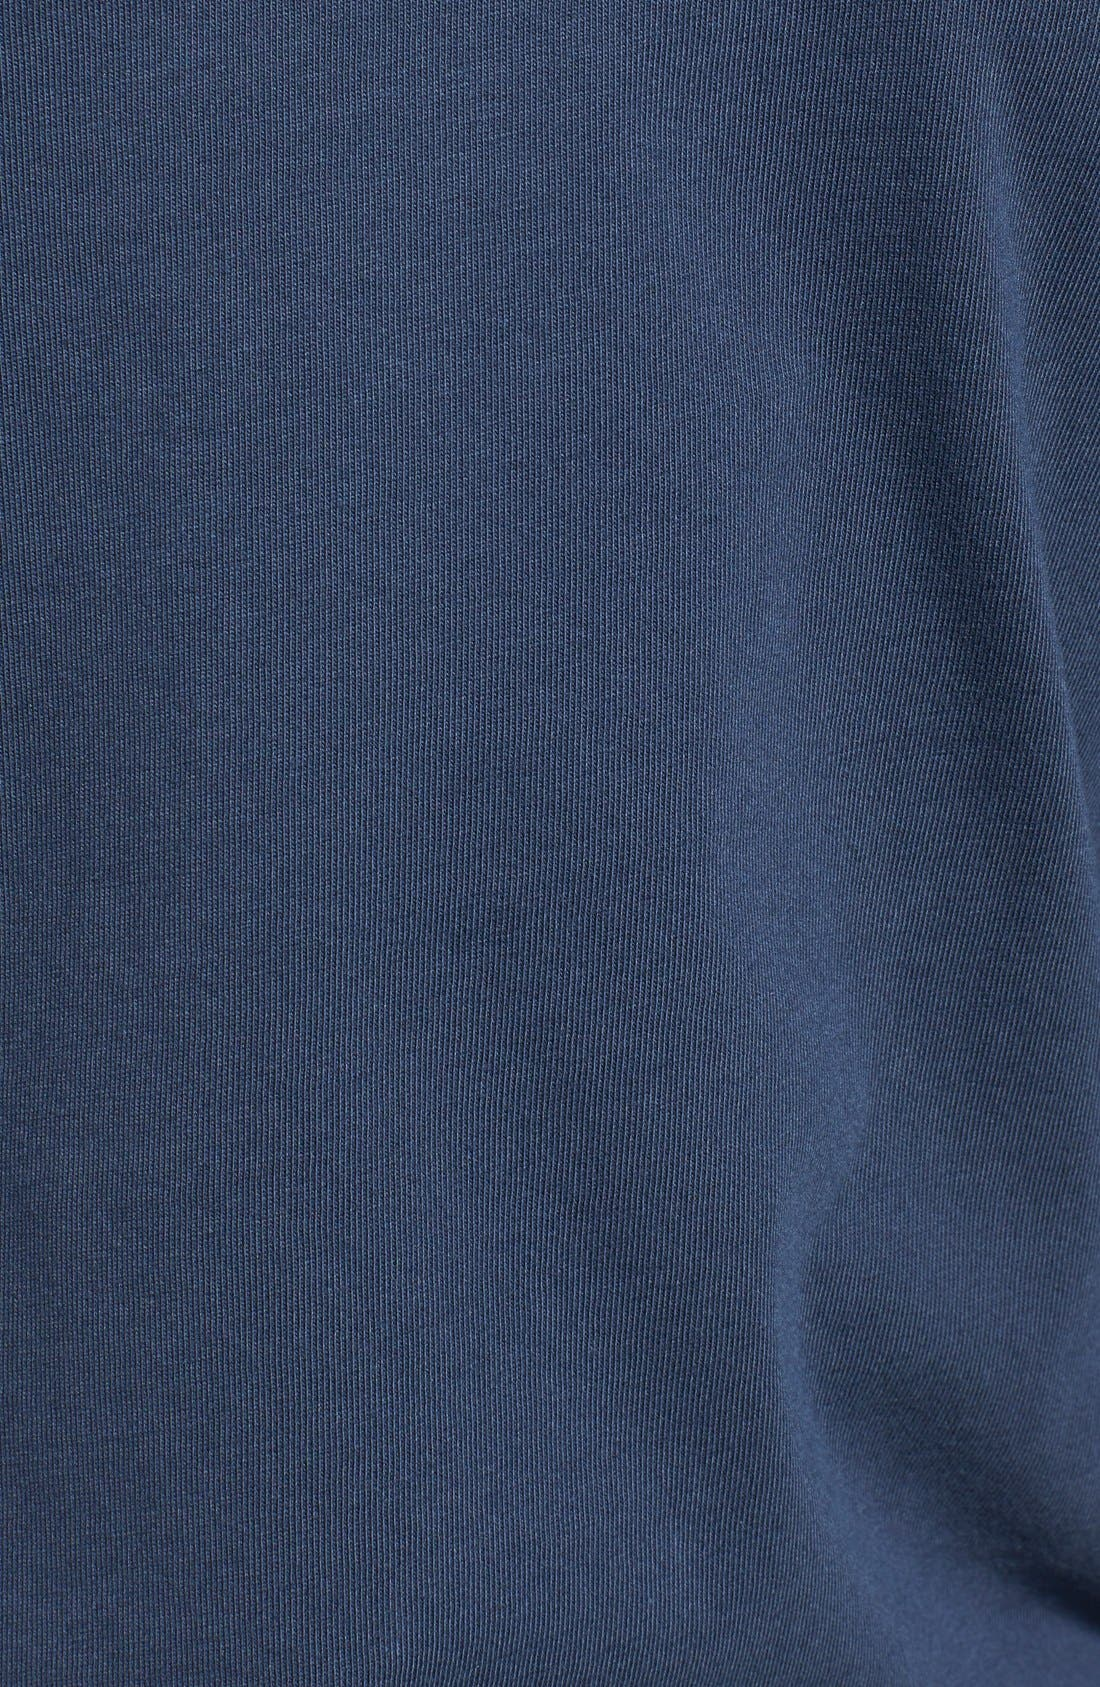 Logo Pocket Long Sleeve Crewneck T-Shirt,                             Alternate thumbnail 3, color,                             Vineyard Navy